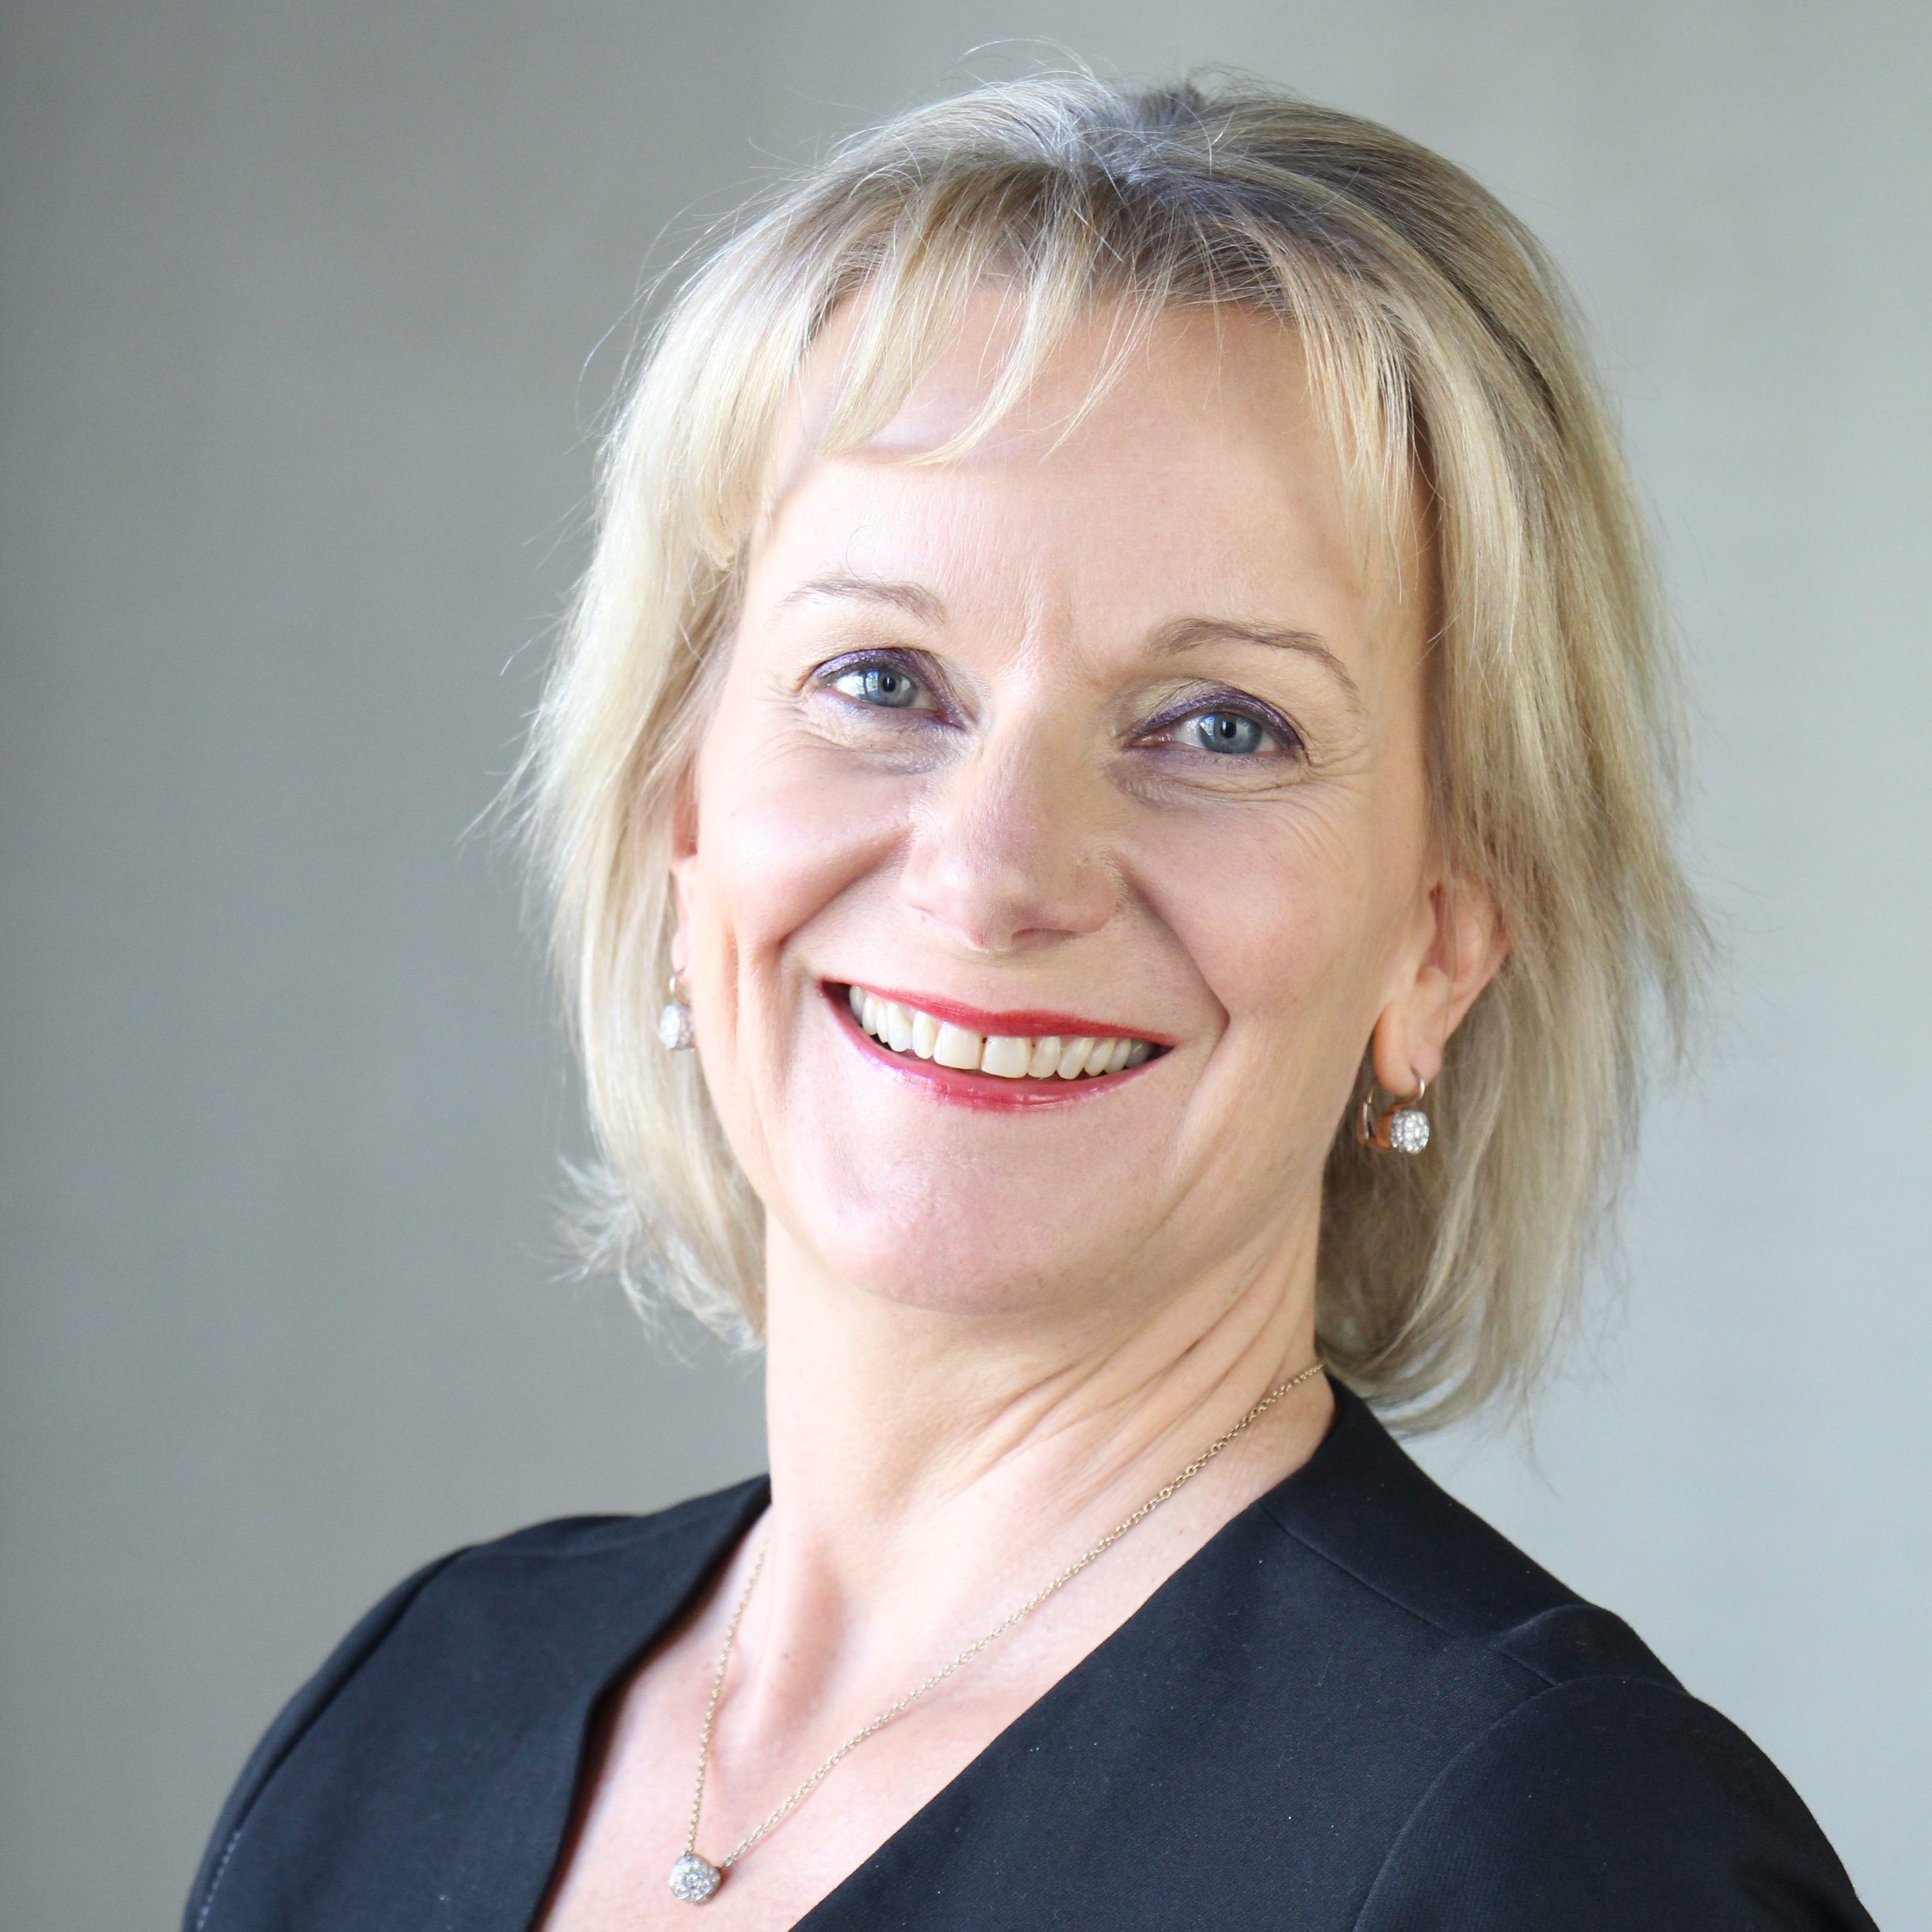 """Be social on social"" - Bettina Geysen - Co Founder"